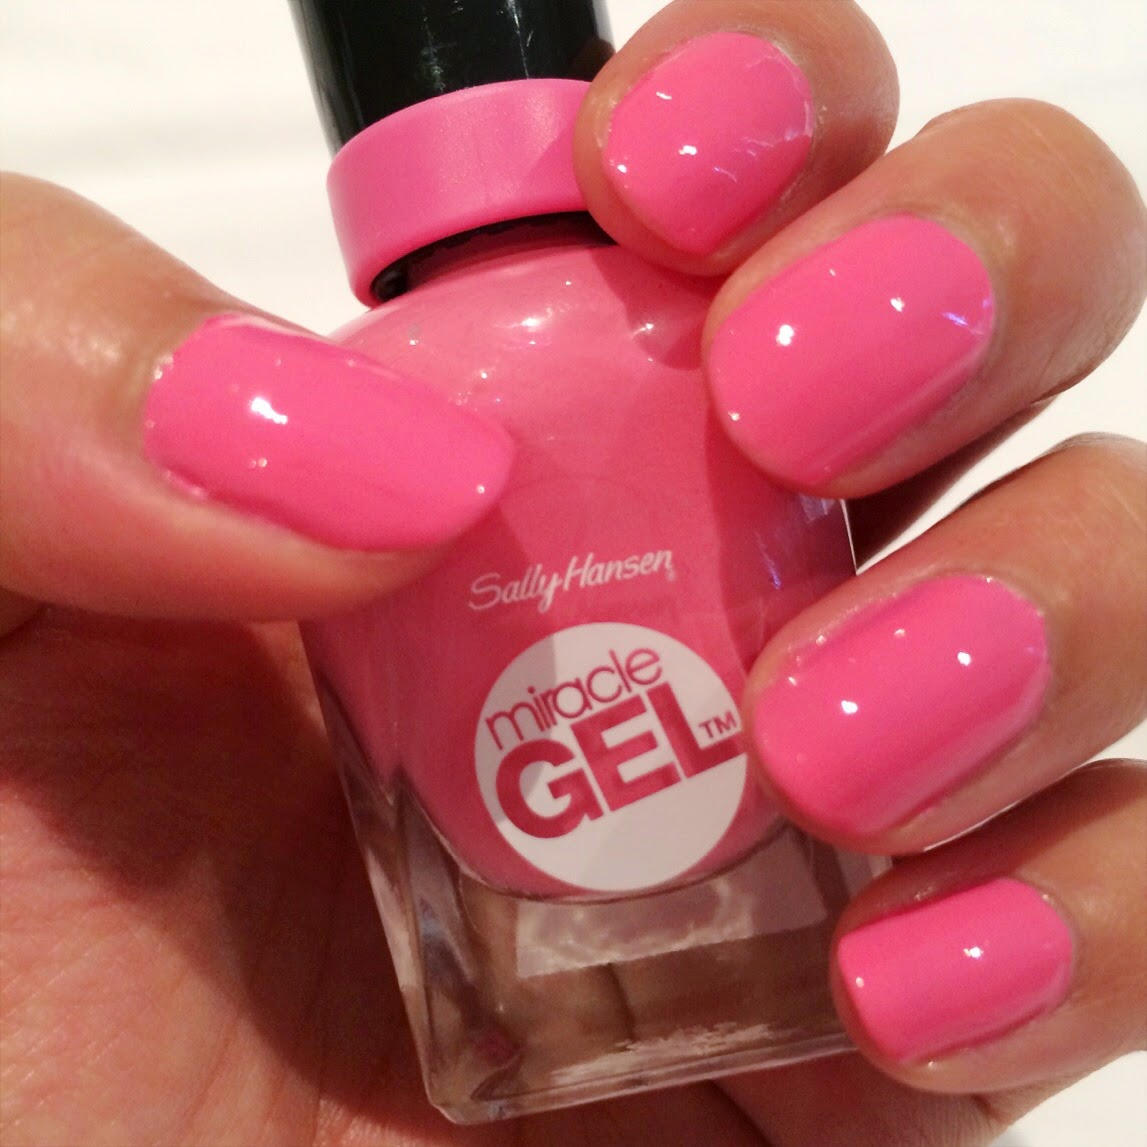 Review sally hansen miracle gel set in 310 shock wave beauty